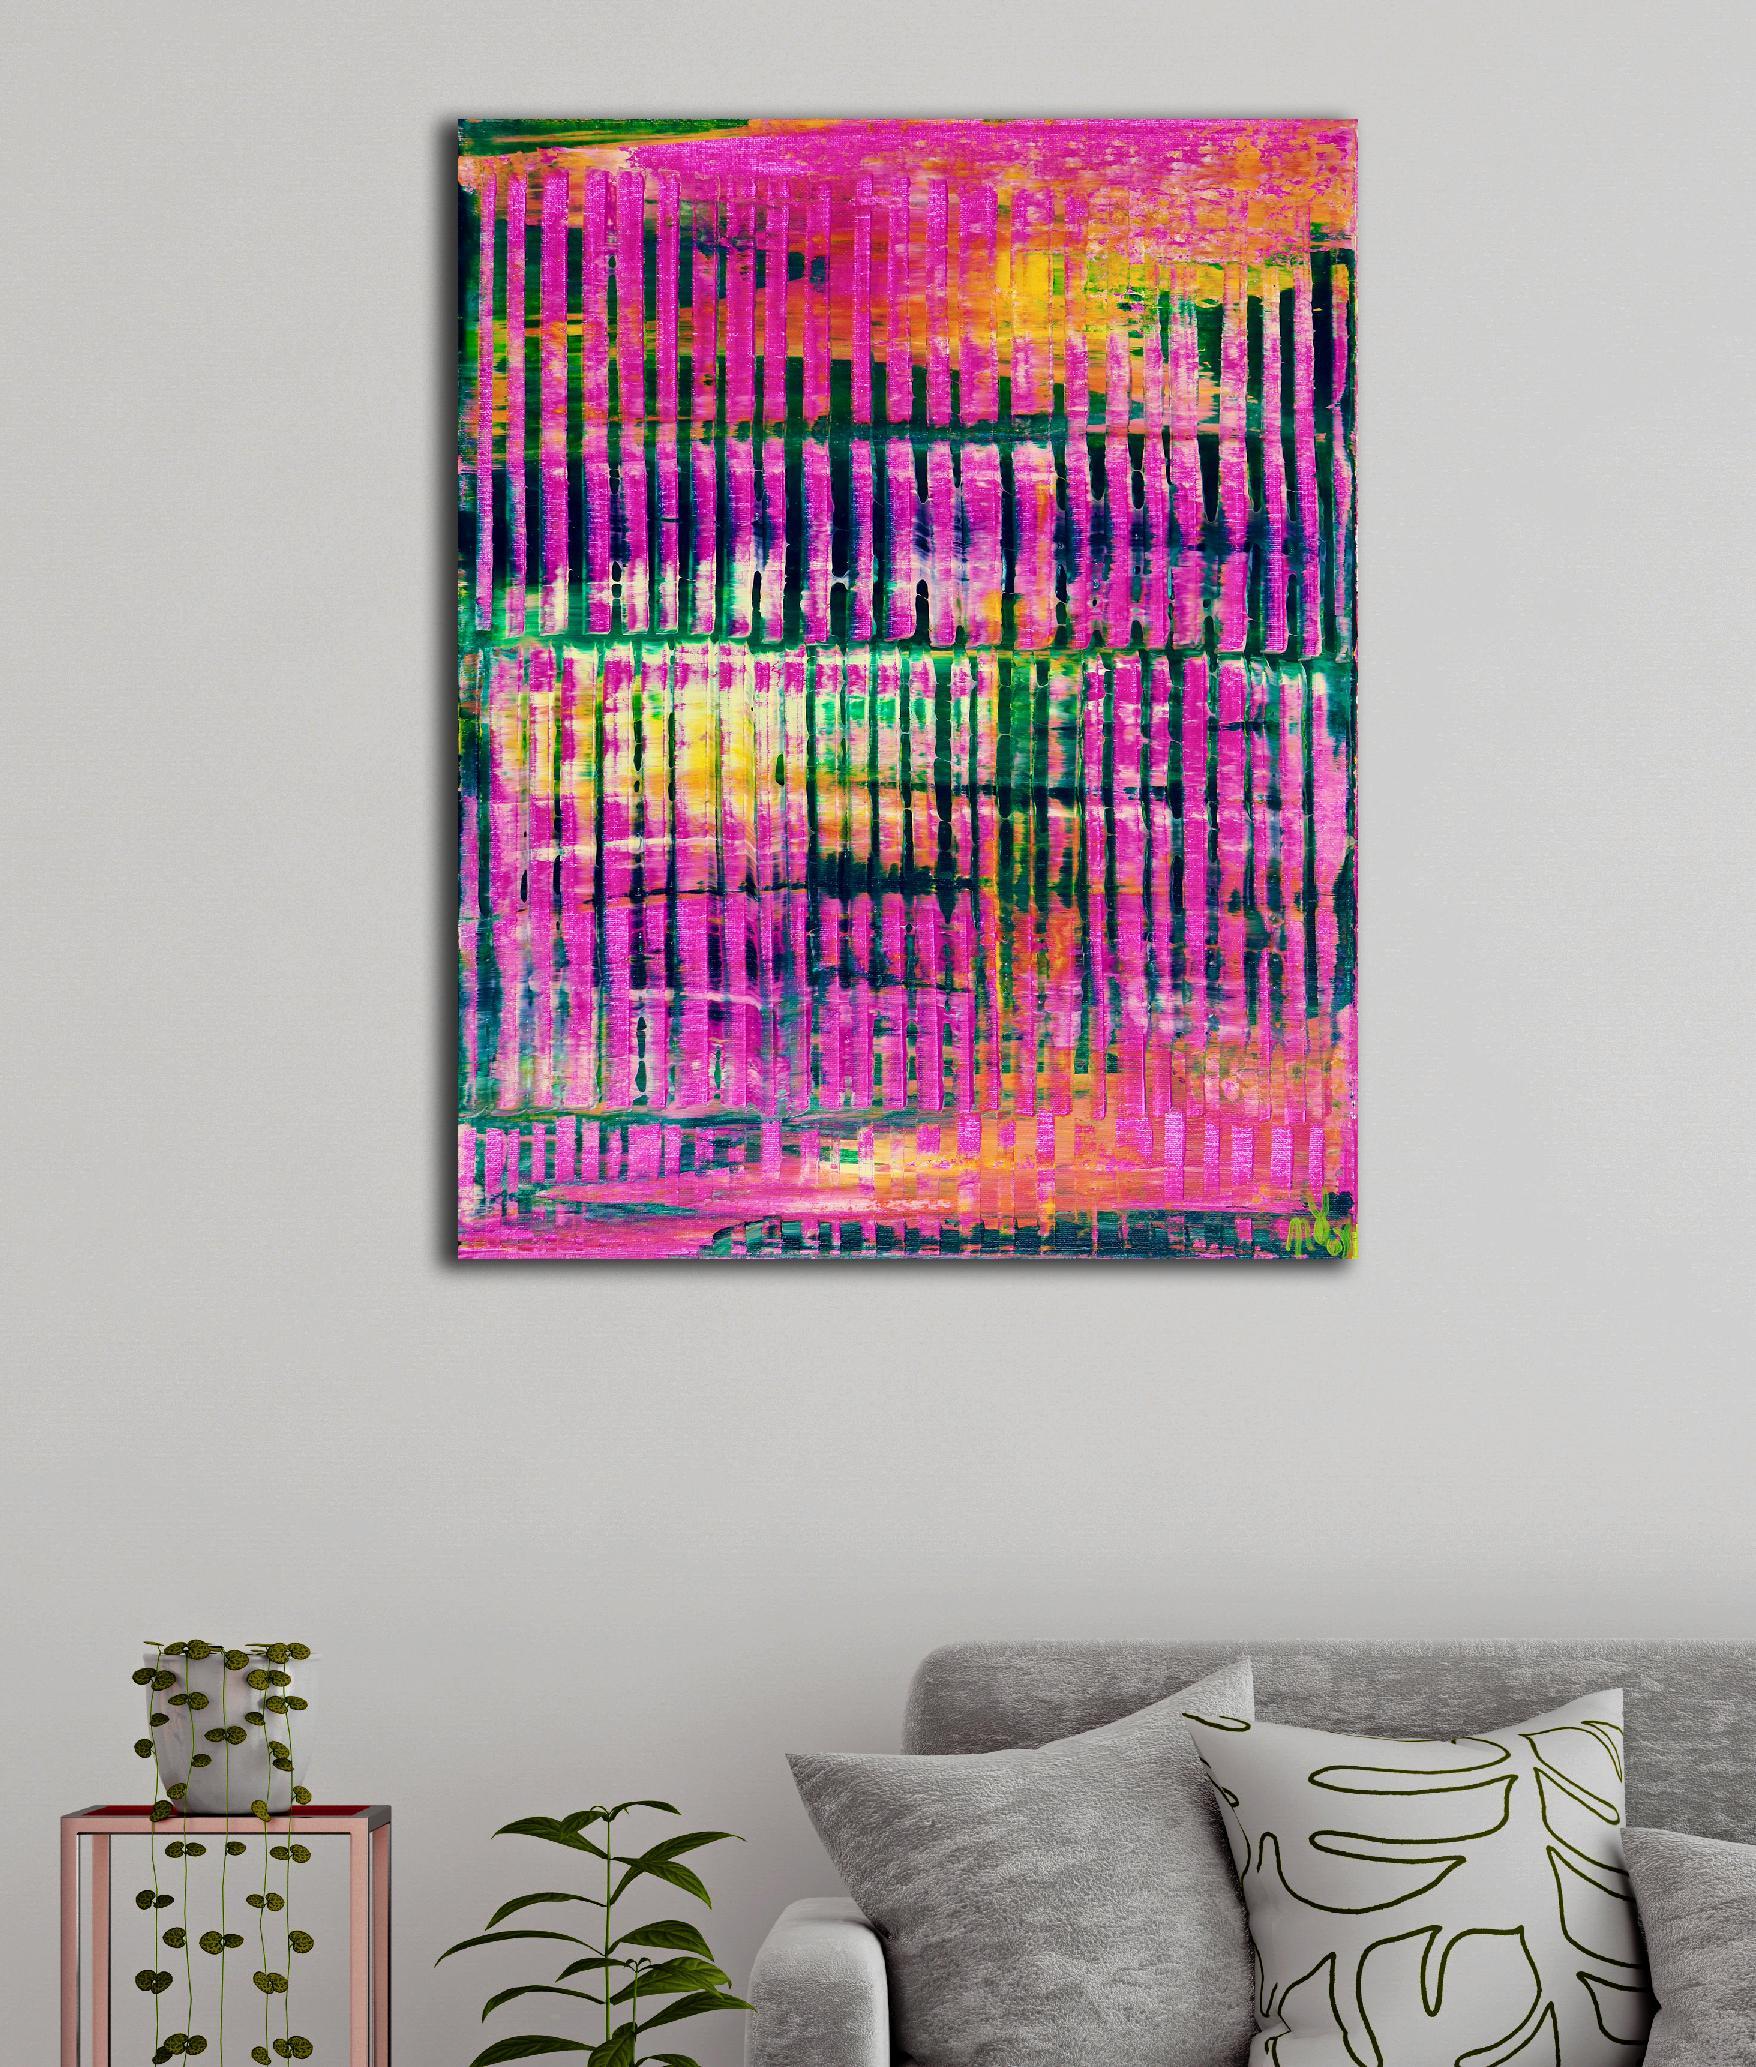 Room View - Pink Refractions (Green Textures) 2 (2020) by Nestor Toro